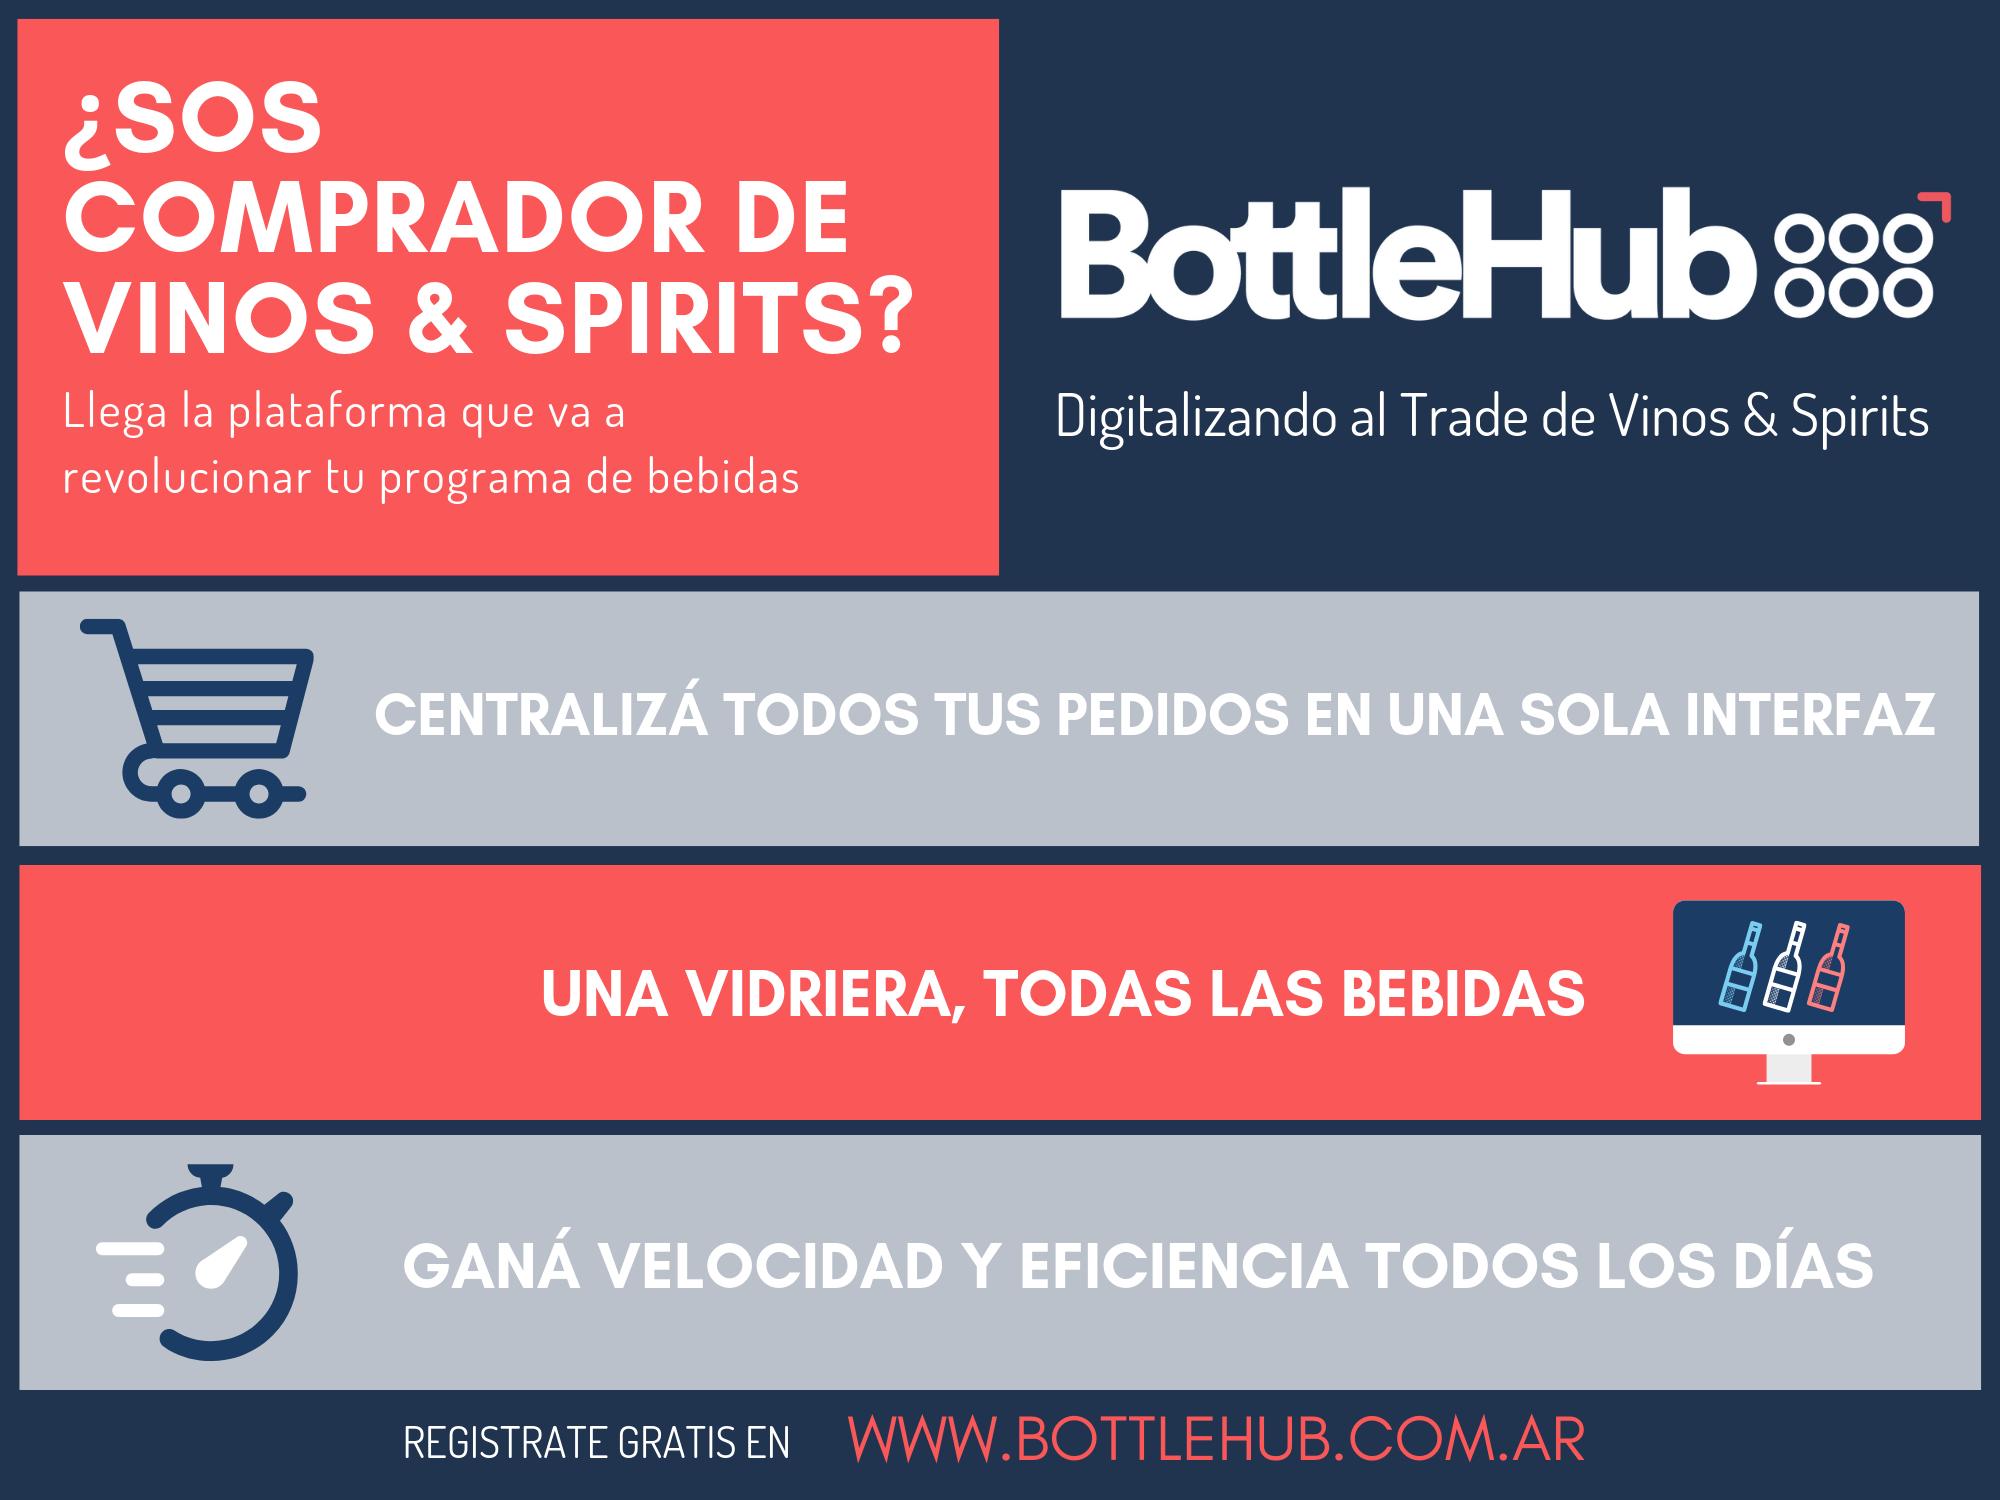 "BottleHub invita - El martes a las 16:40 en el ""Espacio de talleres 2"" de BAC Inspira, la plataforma digital BottleHub presenta una charla sobre"